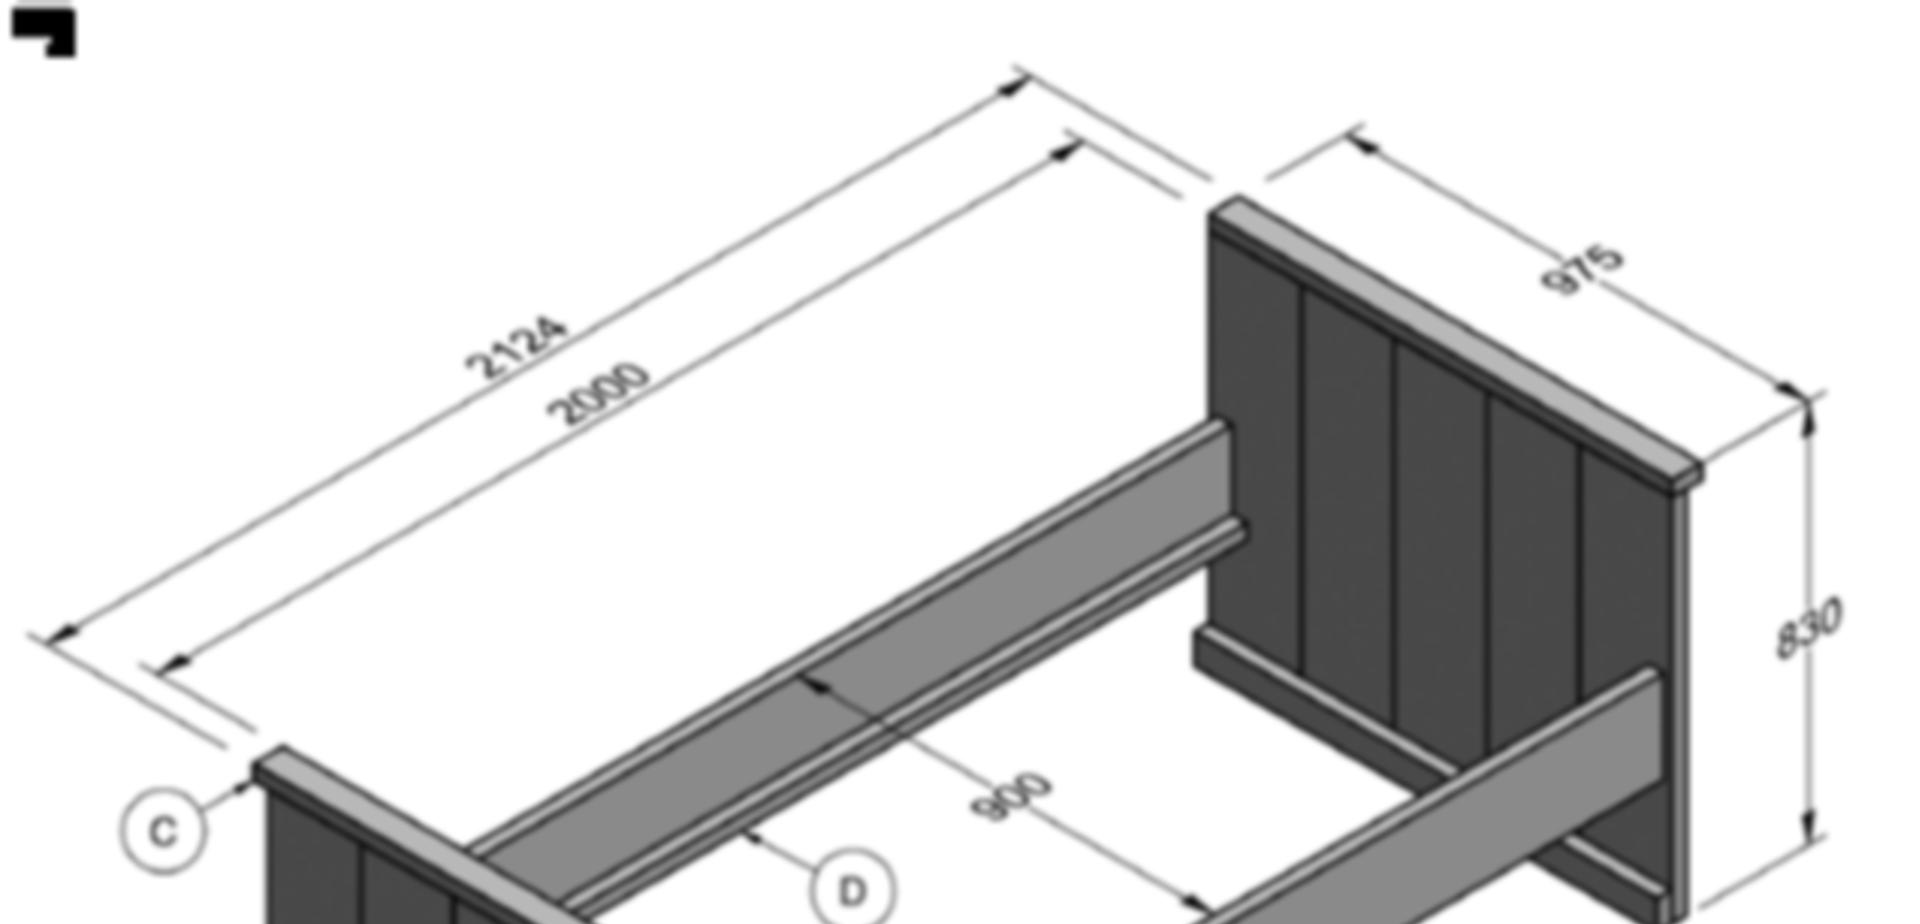 Goede Bouwtekening houten bed | Stappenplan DT-24